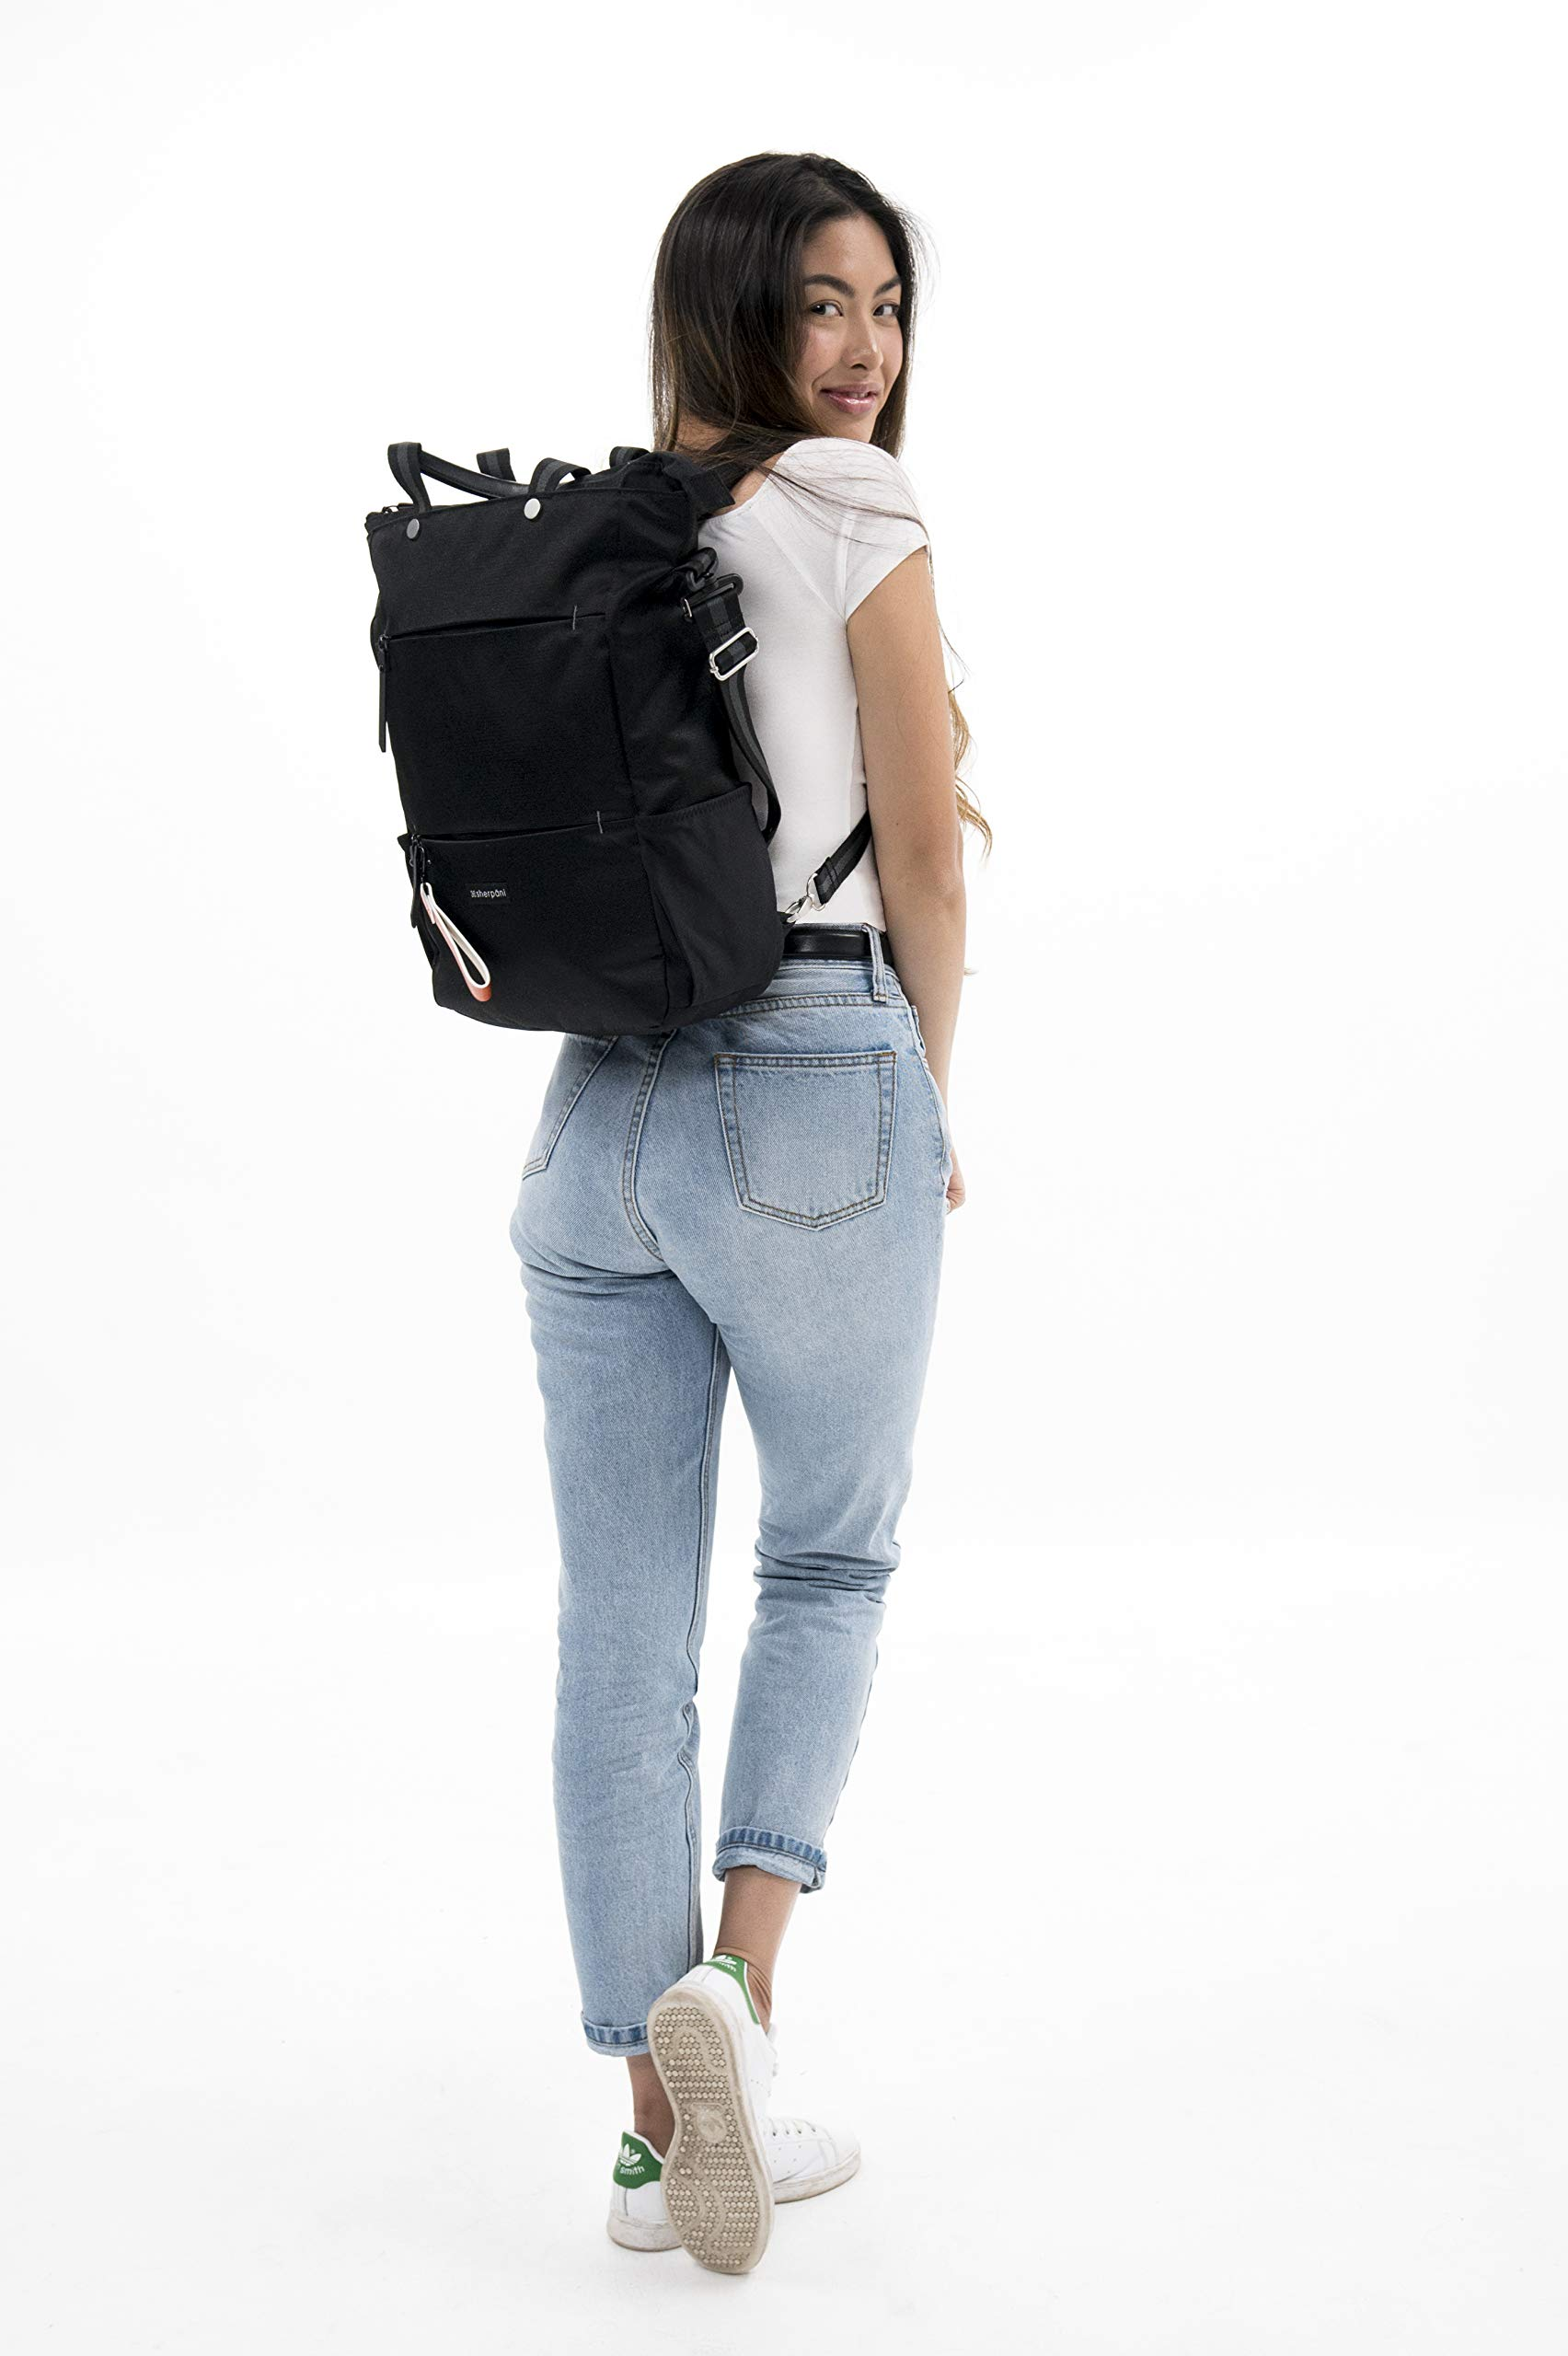 Sherpani Camden Raven Laptop Backpack, Raven by Sherpani (Image #6)